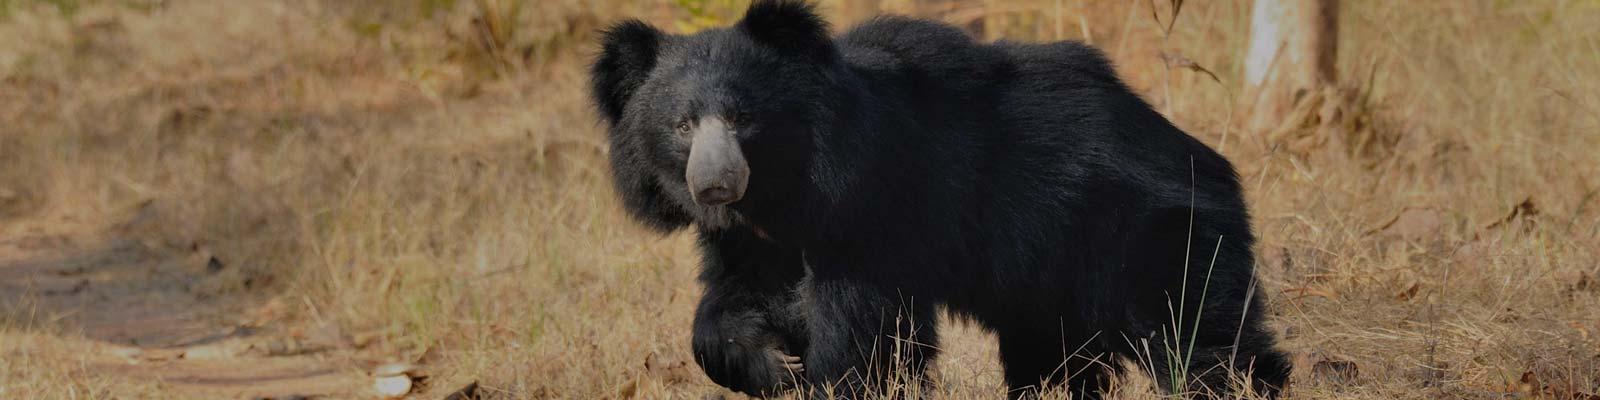 Bear in kanha national park